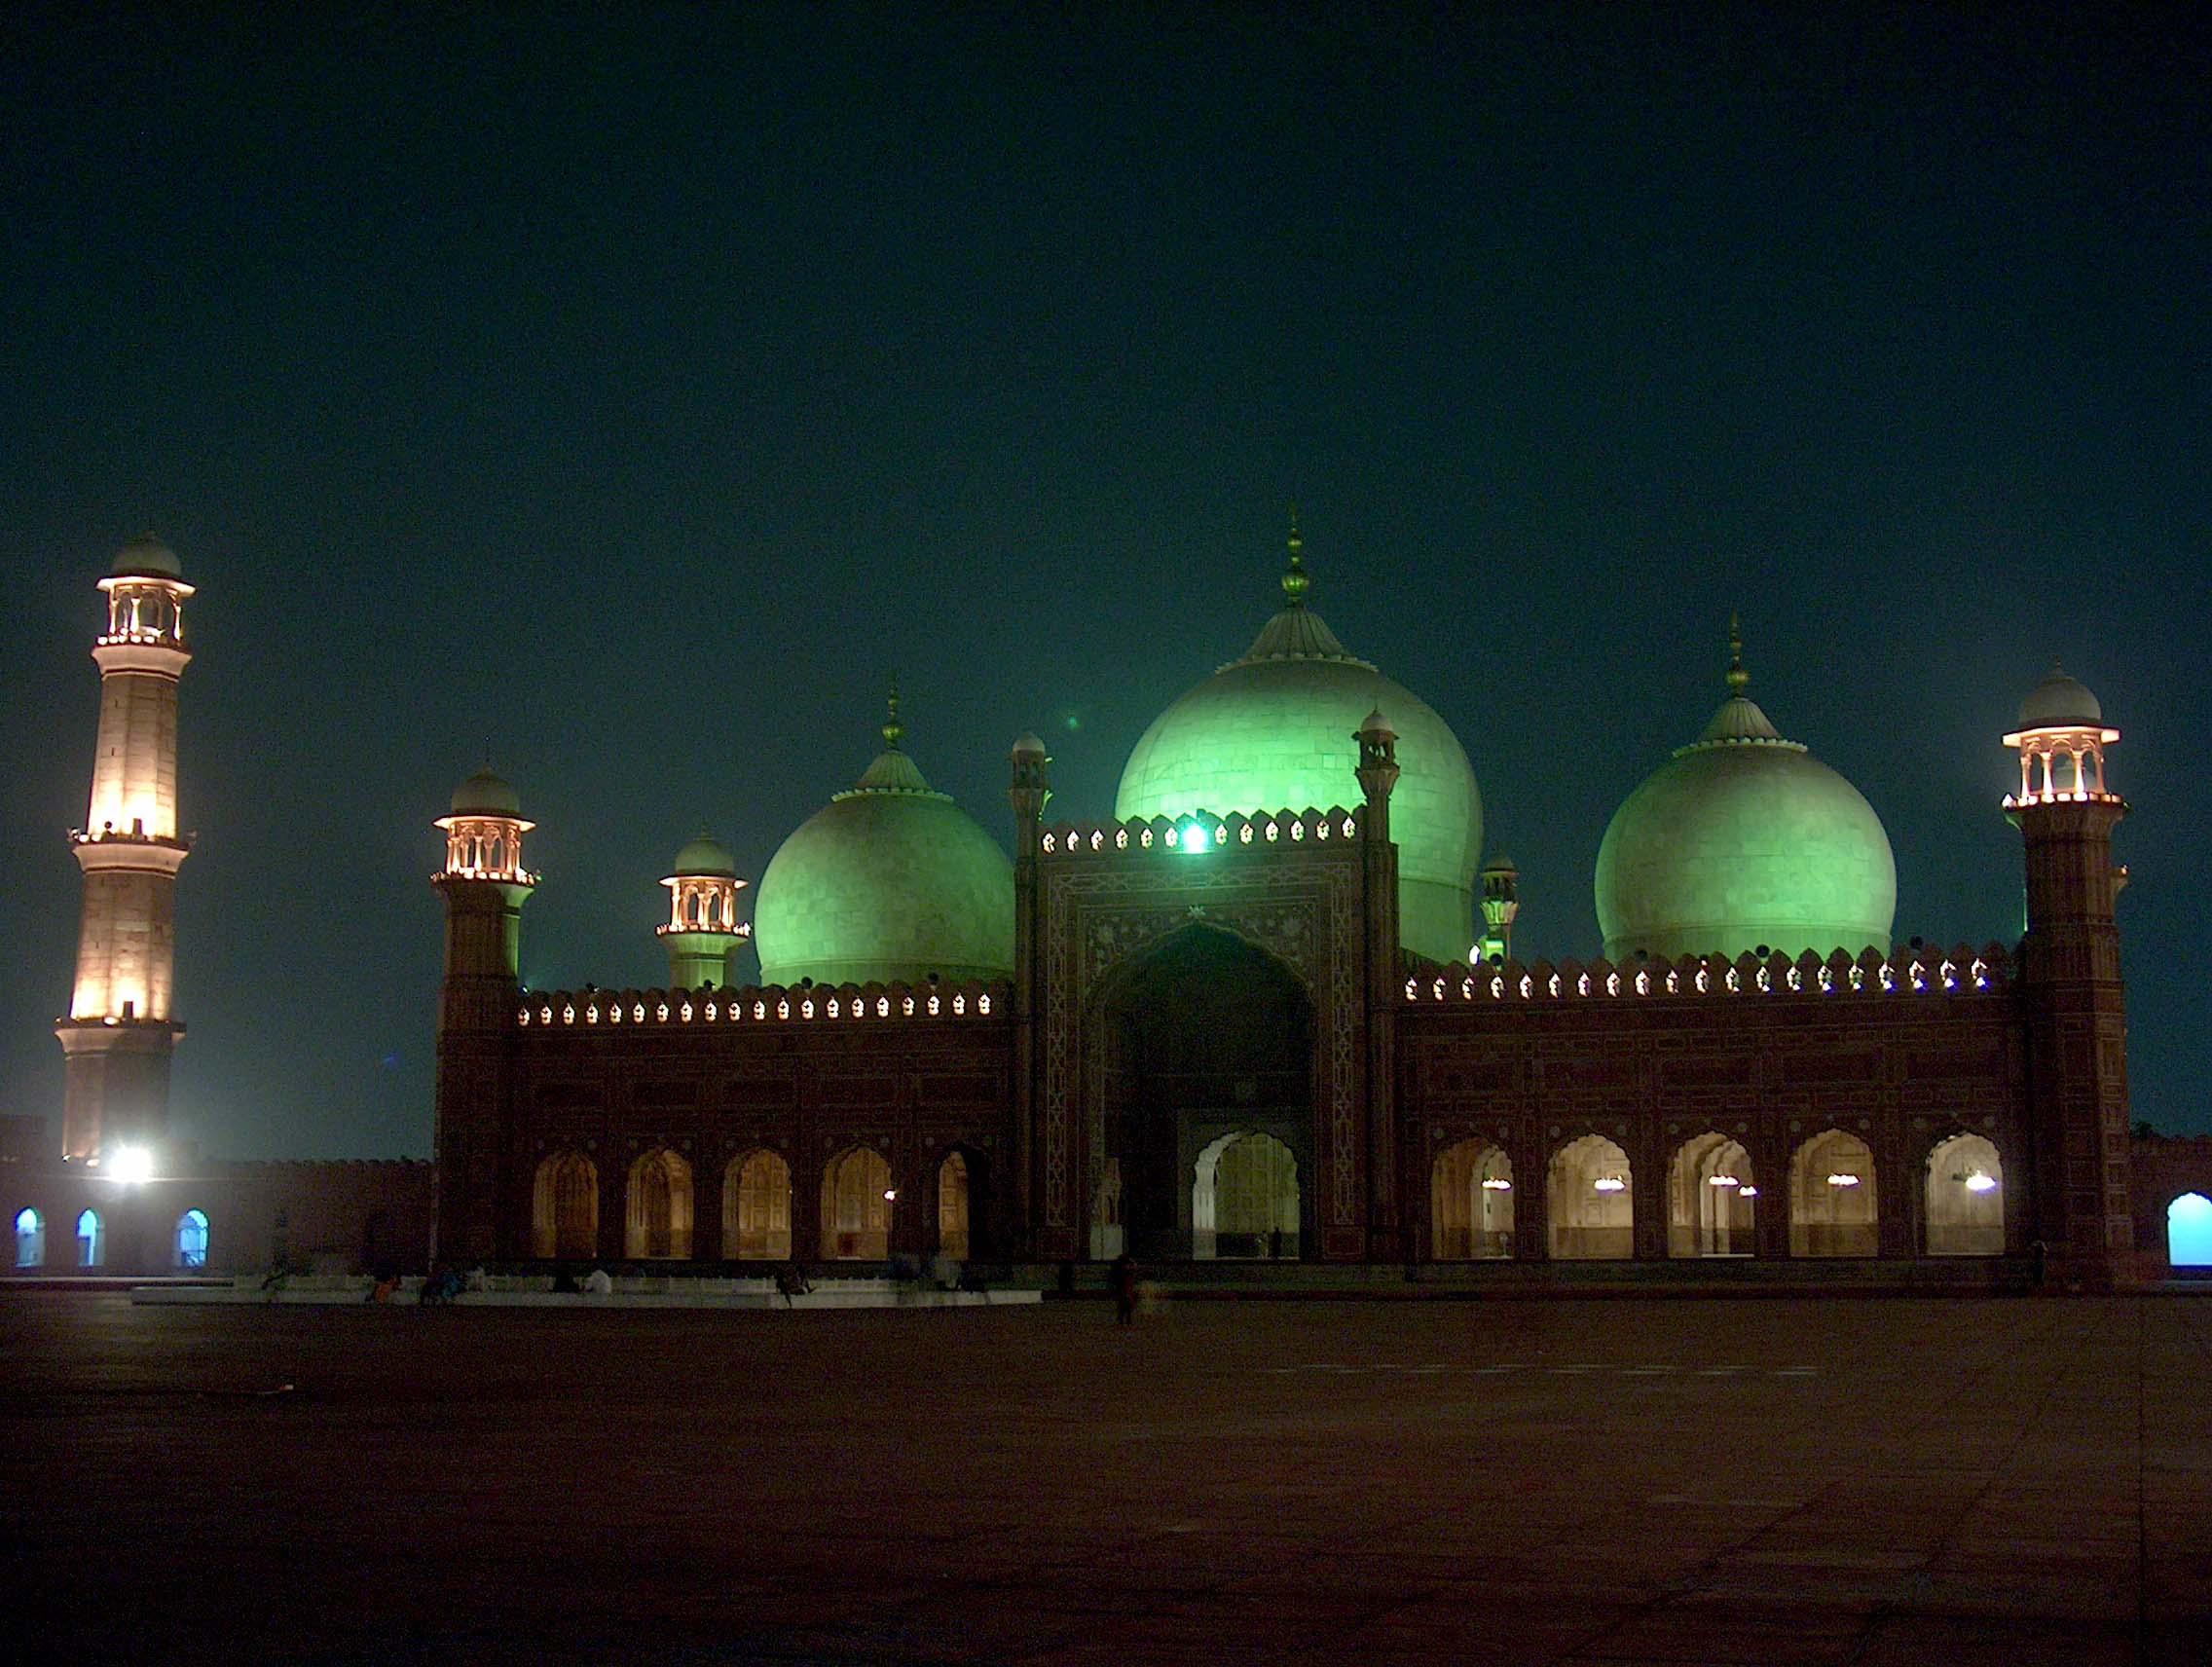 India, Asia, Taj Mahal at night